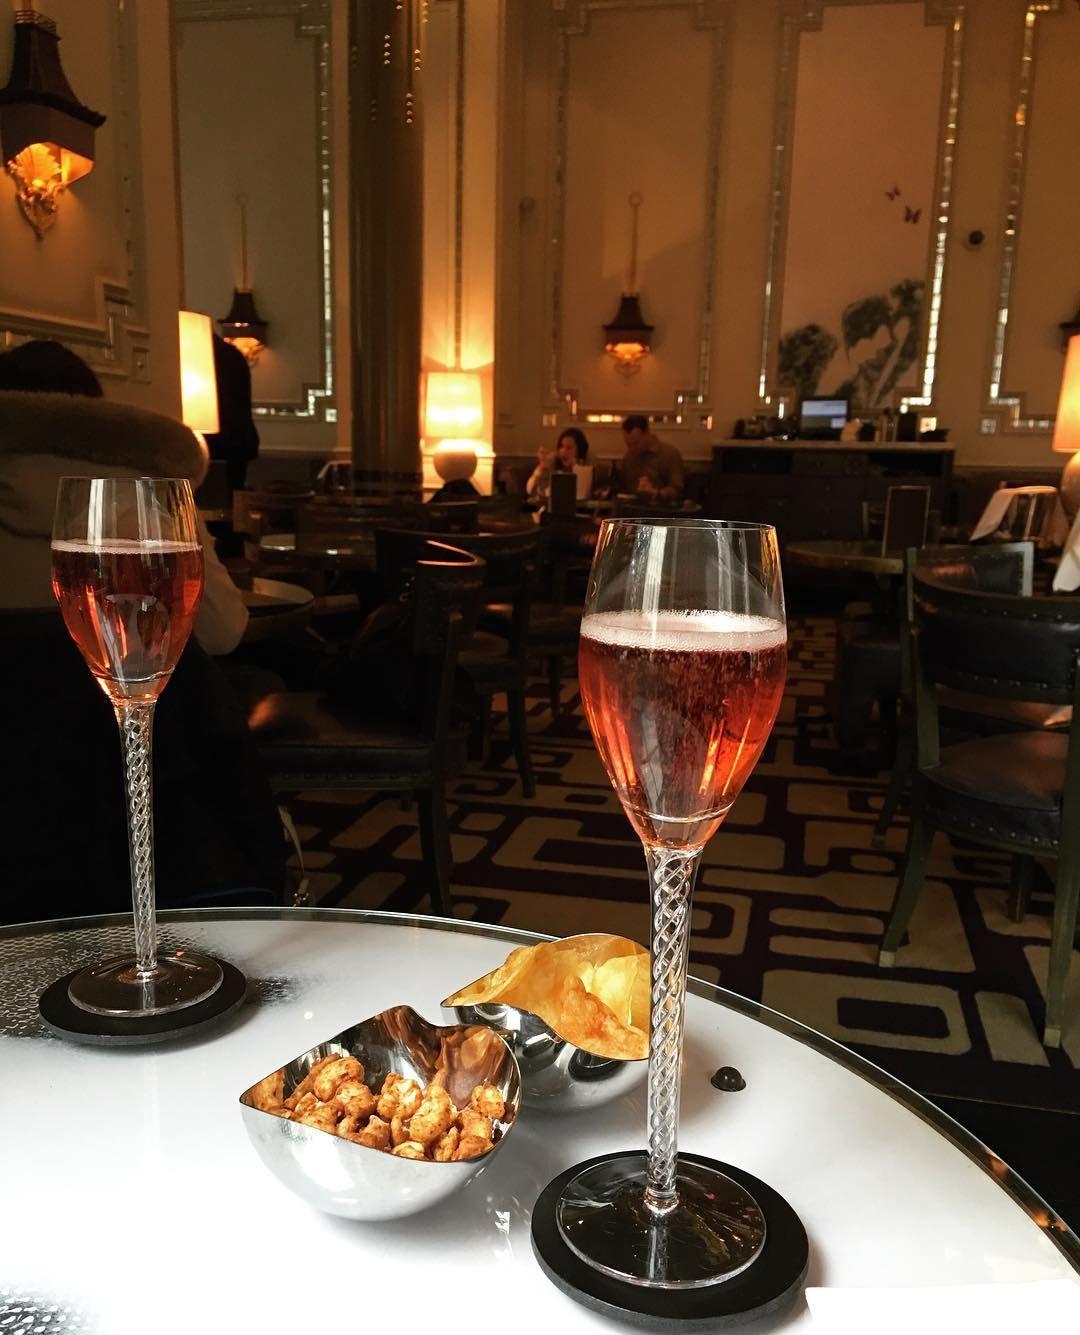 Champagnelunsj på The Langham  Liv Heidi & Terje hvor er dere? #pinkchampagne @leadinghotelsoftheworld @langham_london #svipptur #24timer #london #voksenferie #konsert #noshopping @alexander_grieg by bmgrieg